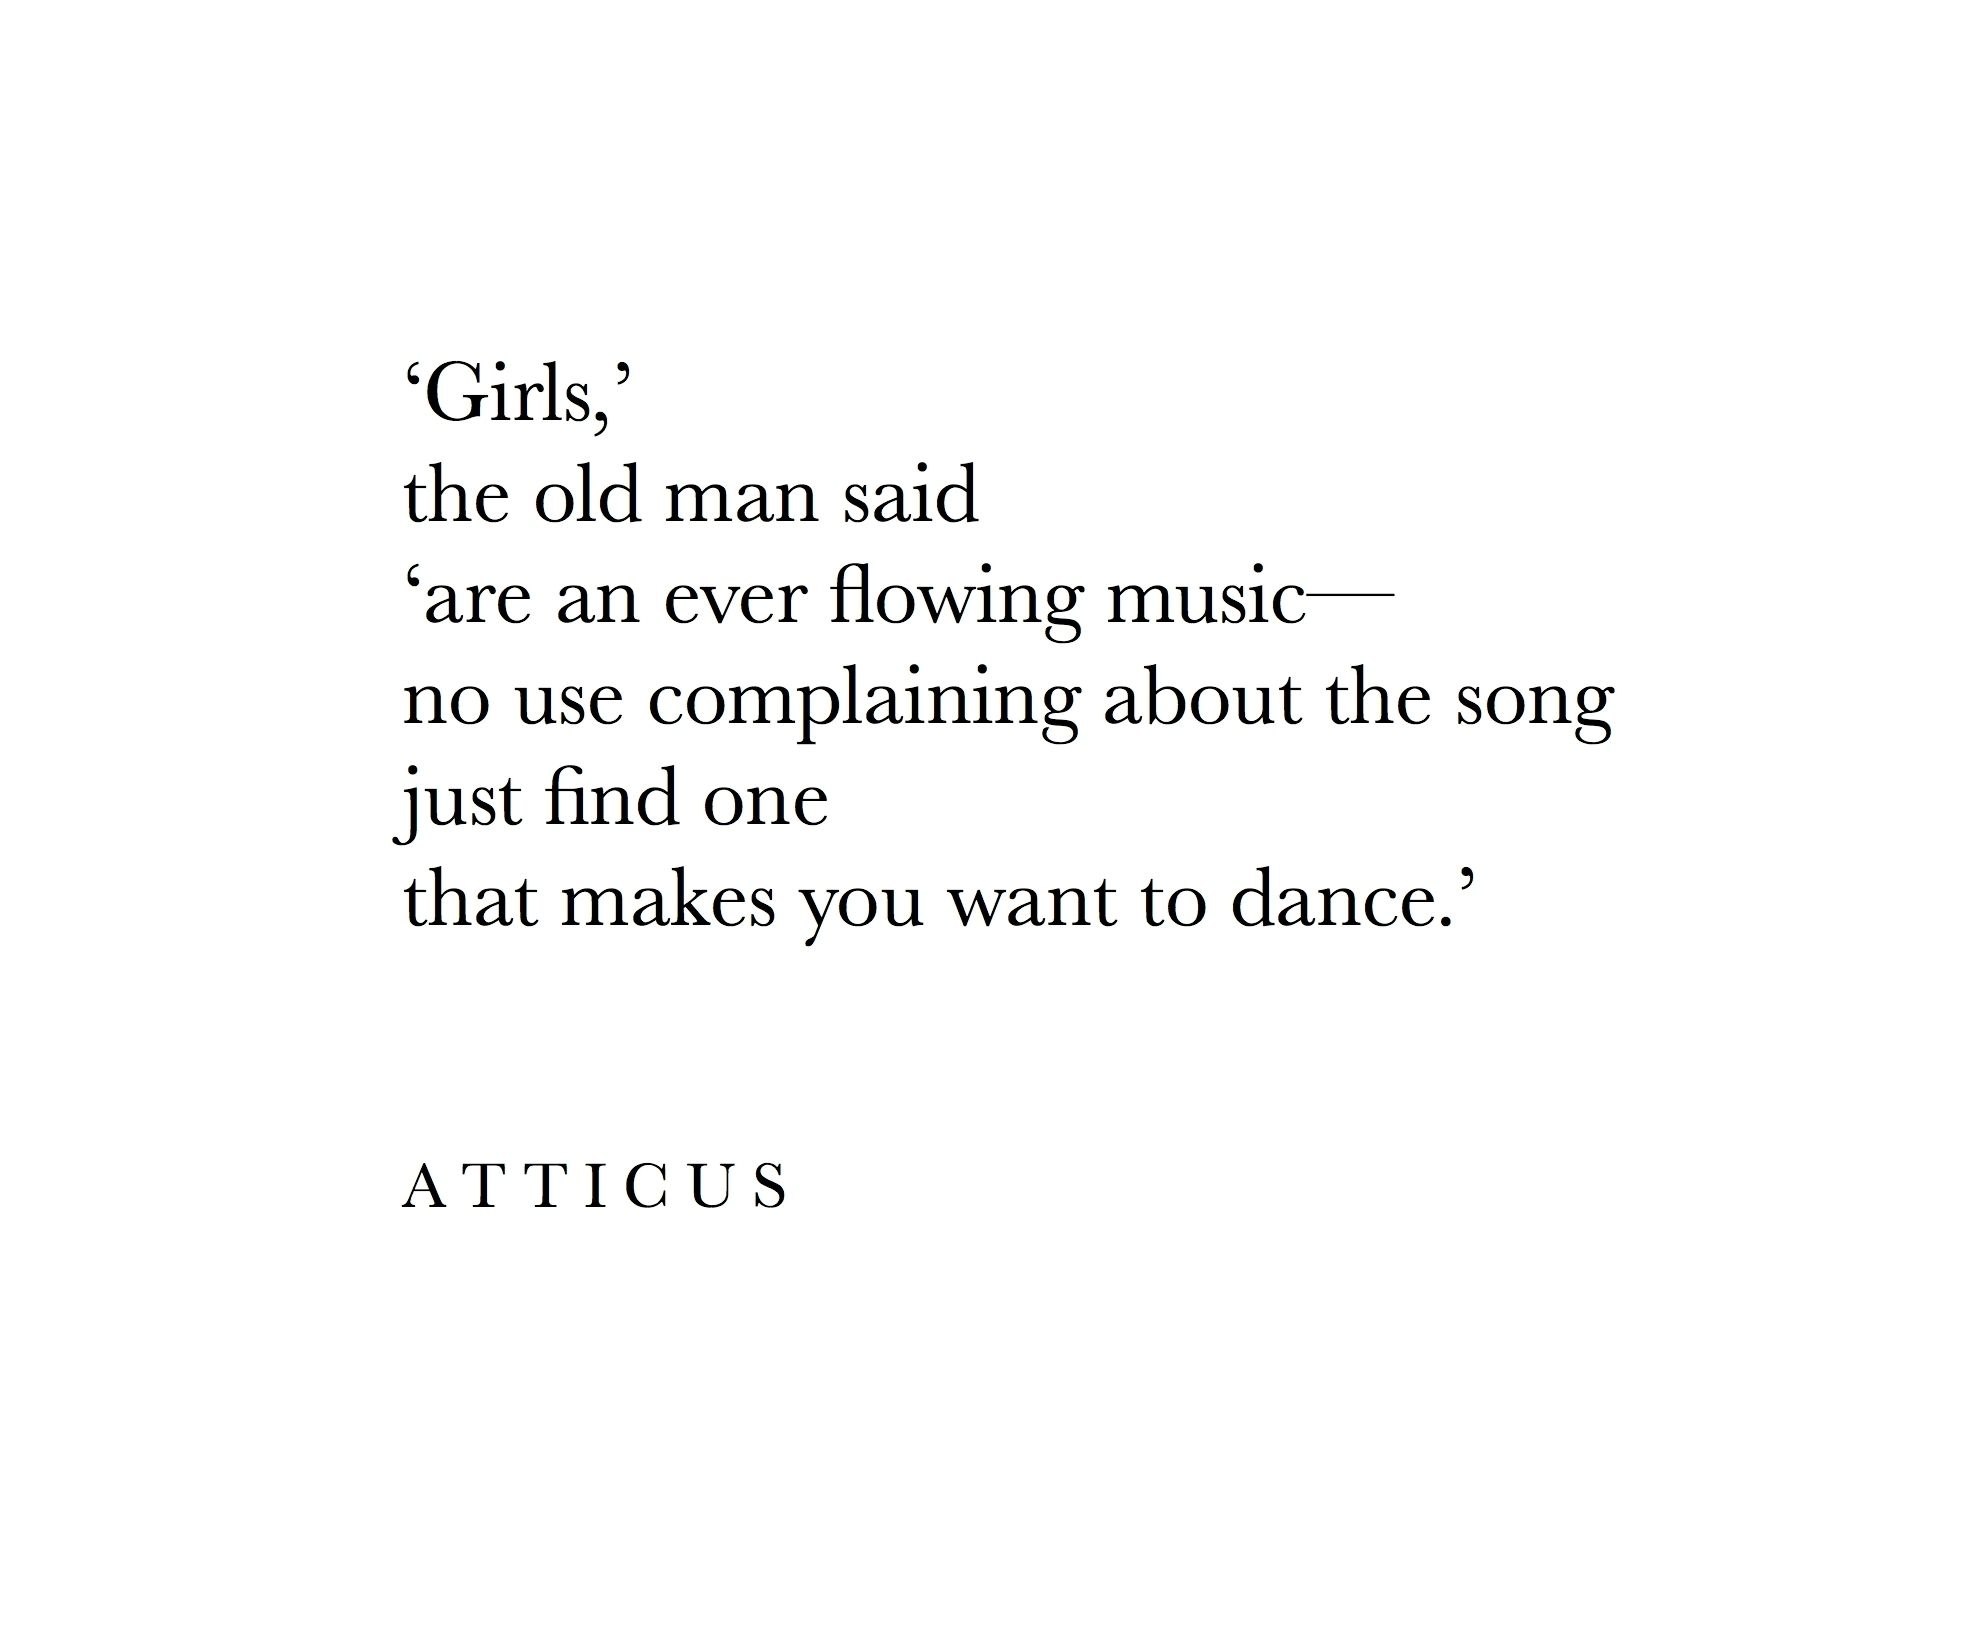 Just Find One Atticuspoetry Atticus Poetry Love  -7848